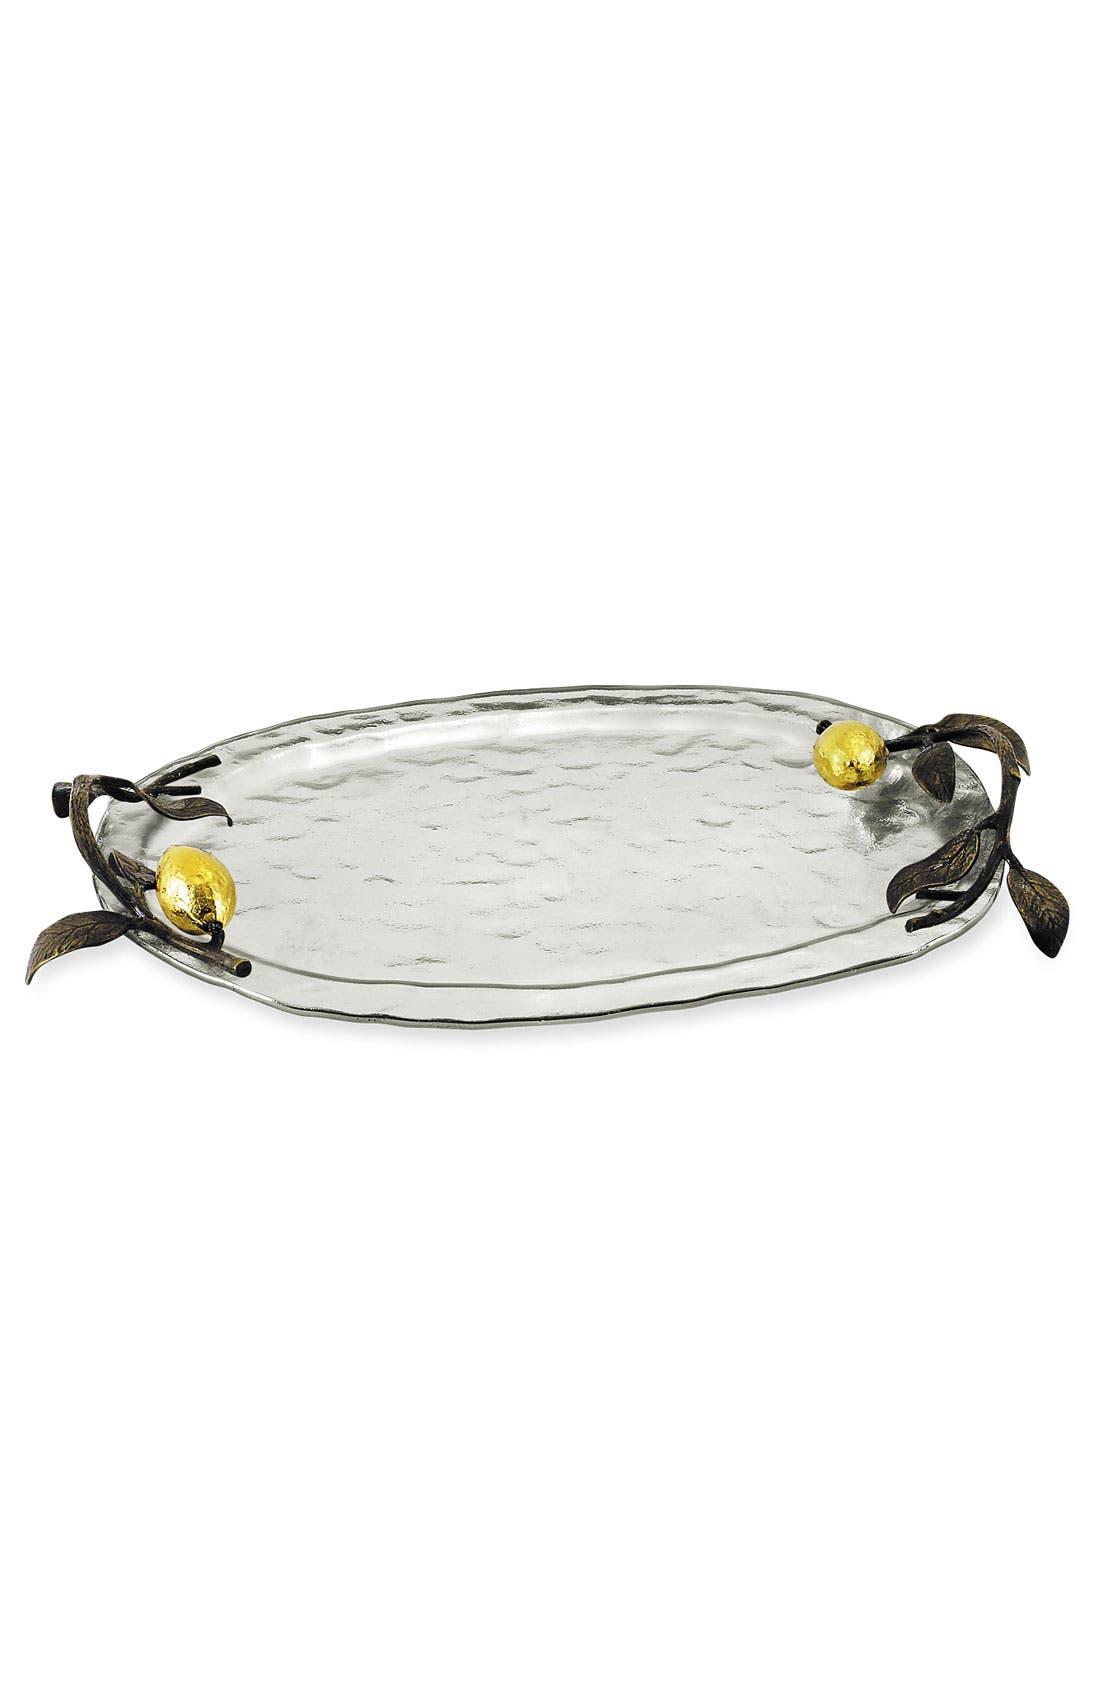 'Lemonwood' Plated Glass Tray,                         Main,                         color, Silver Glass